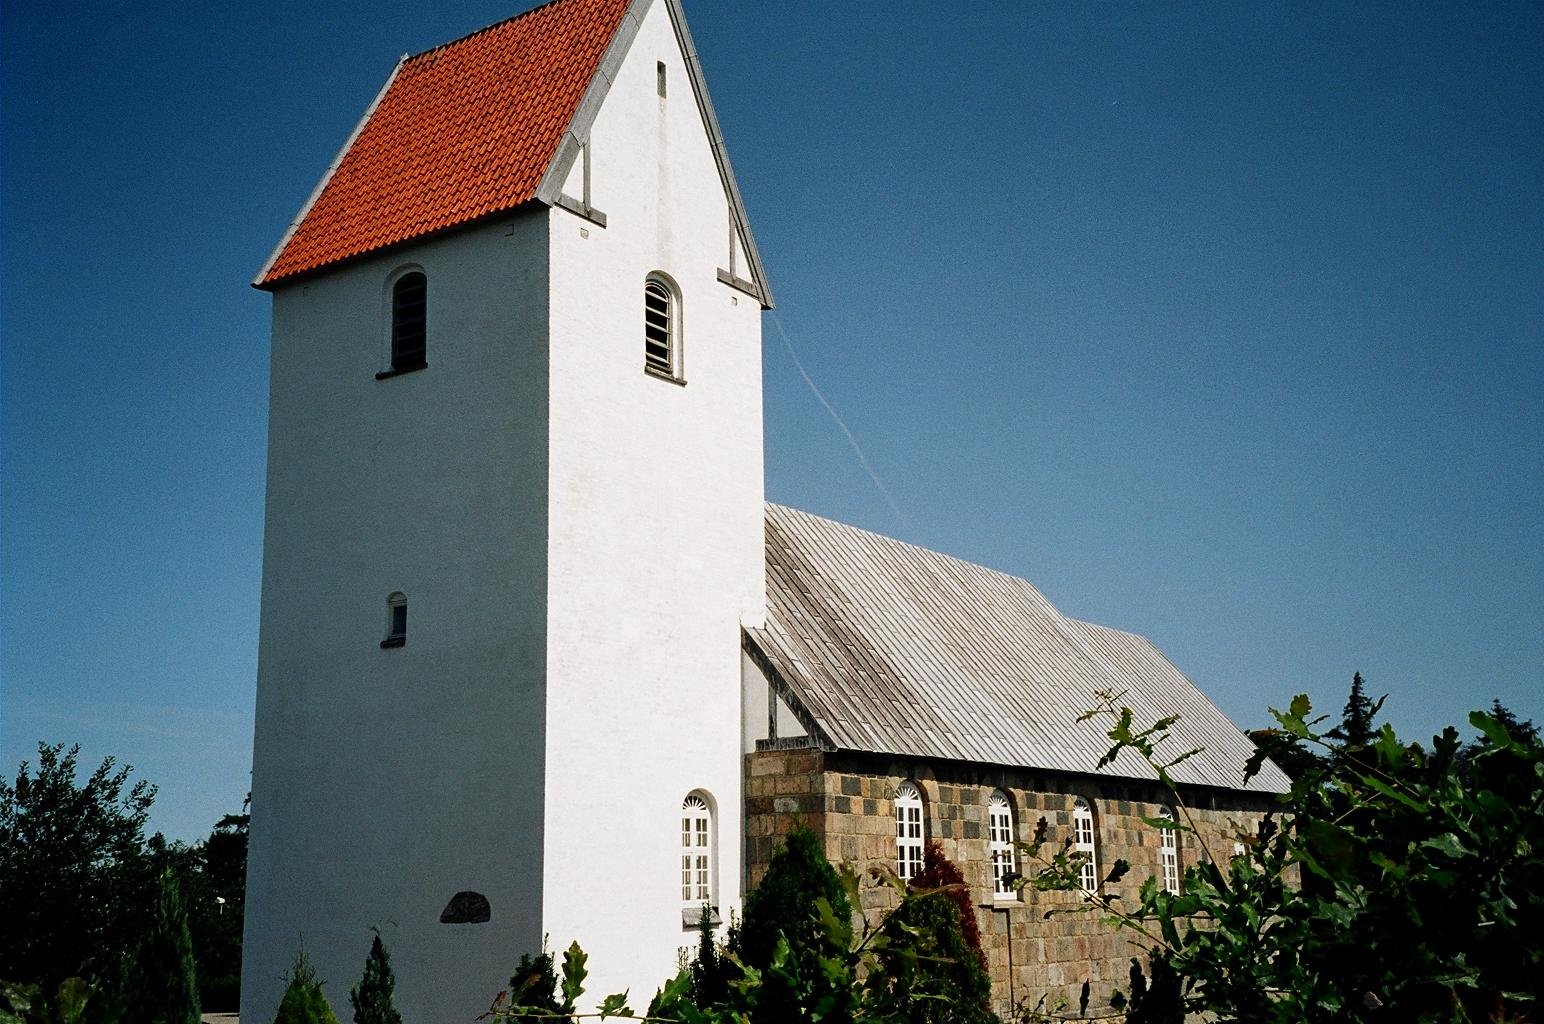 Flynder Kirke